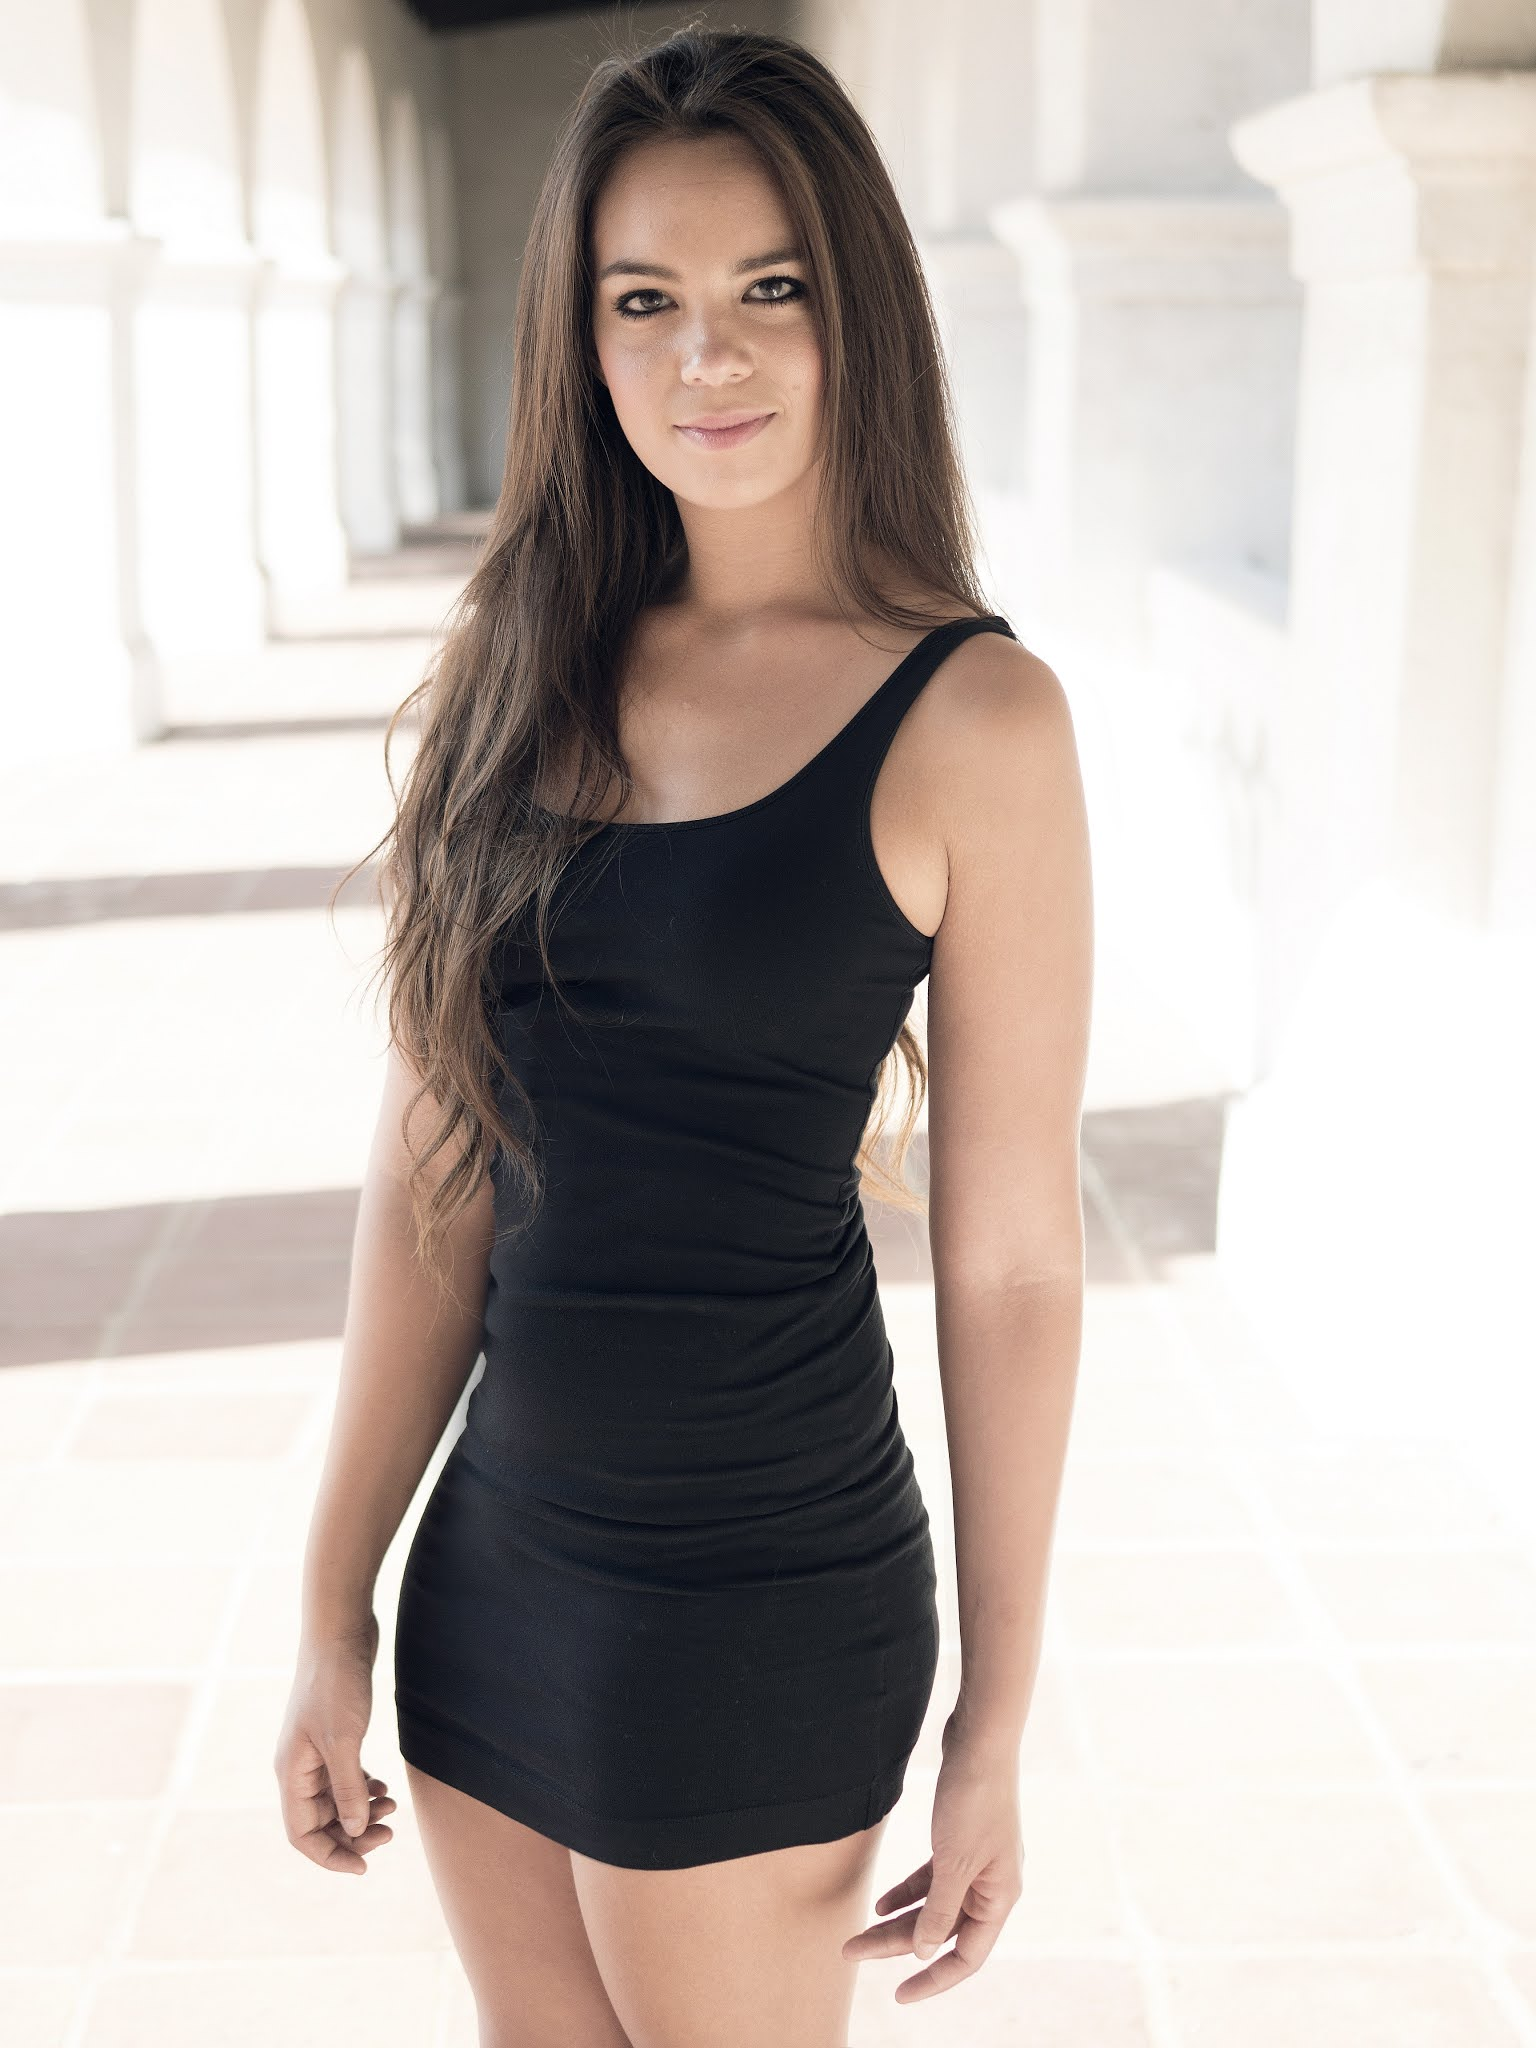 secret woman body facts